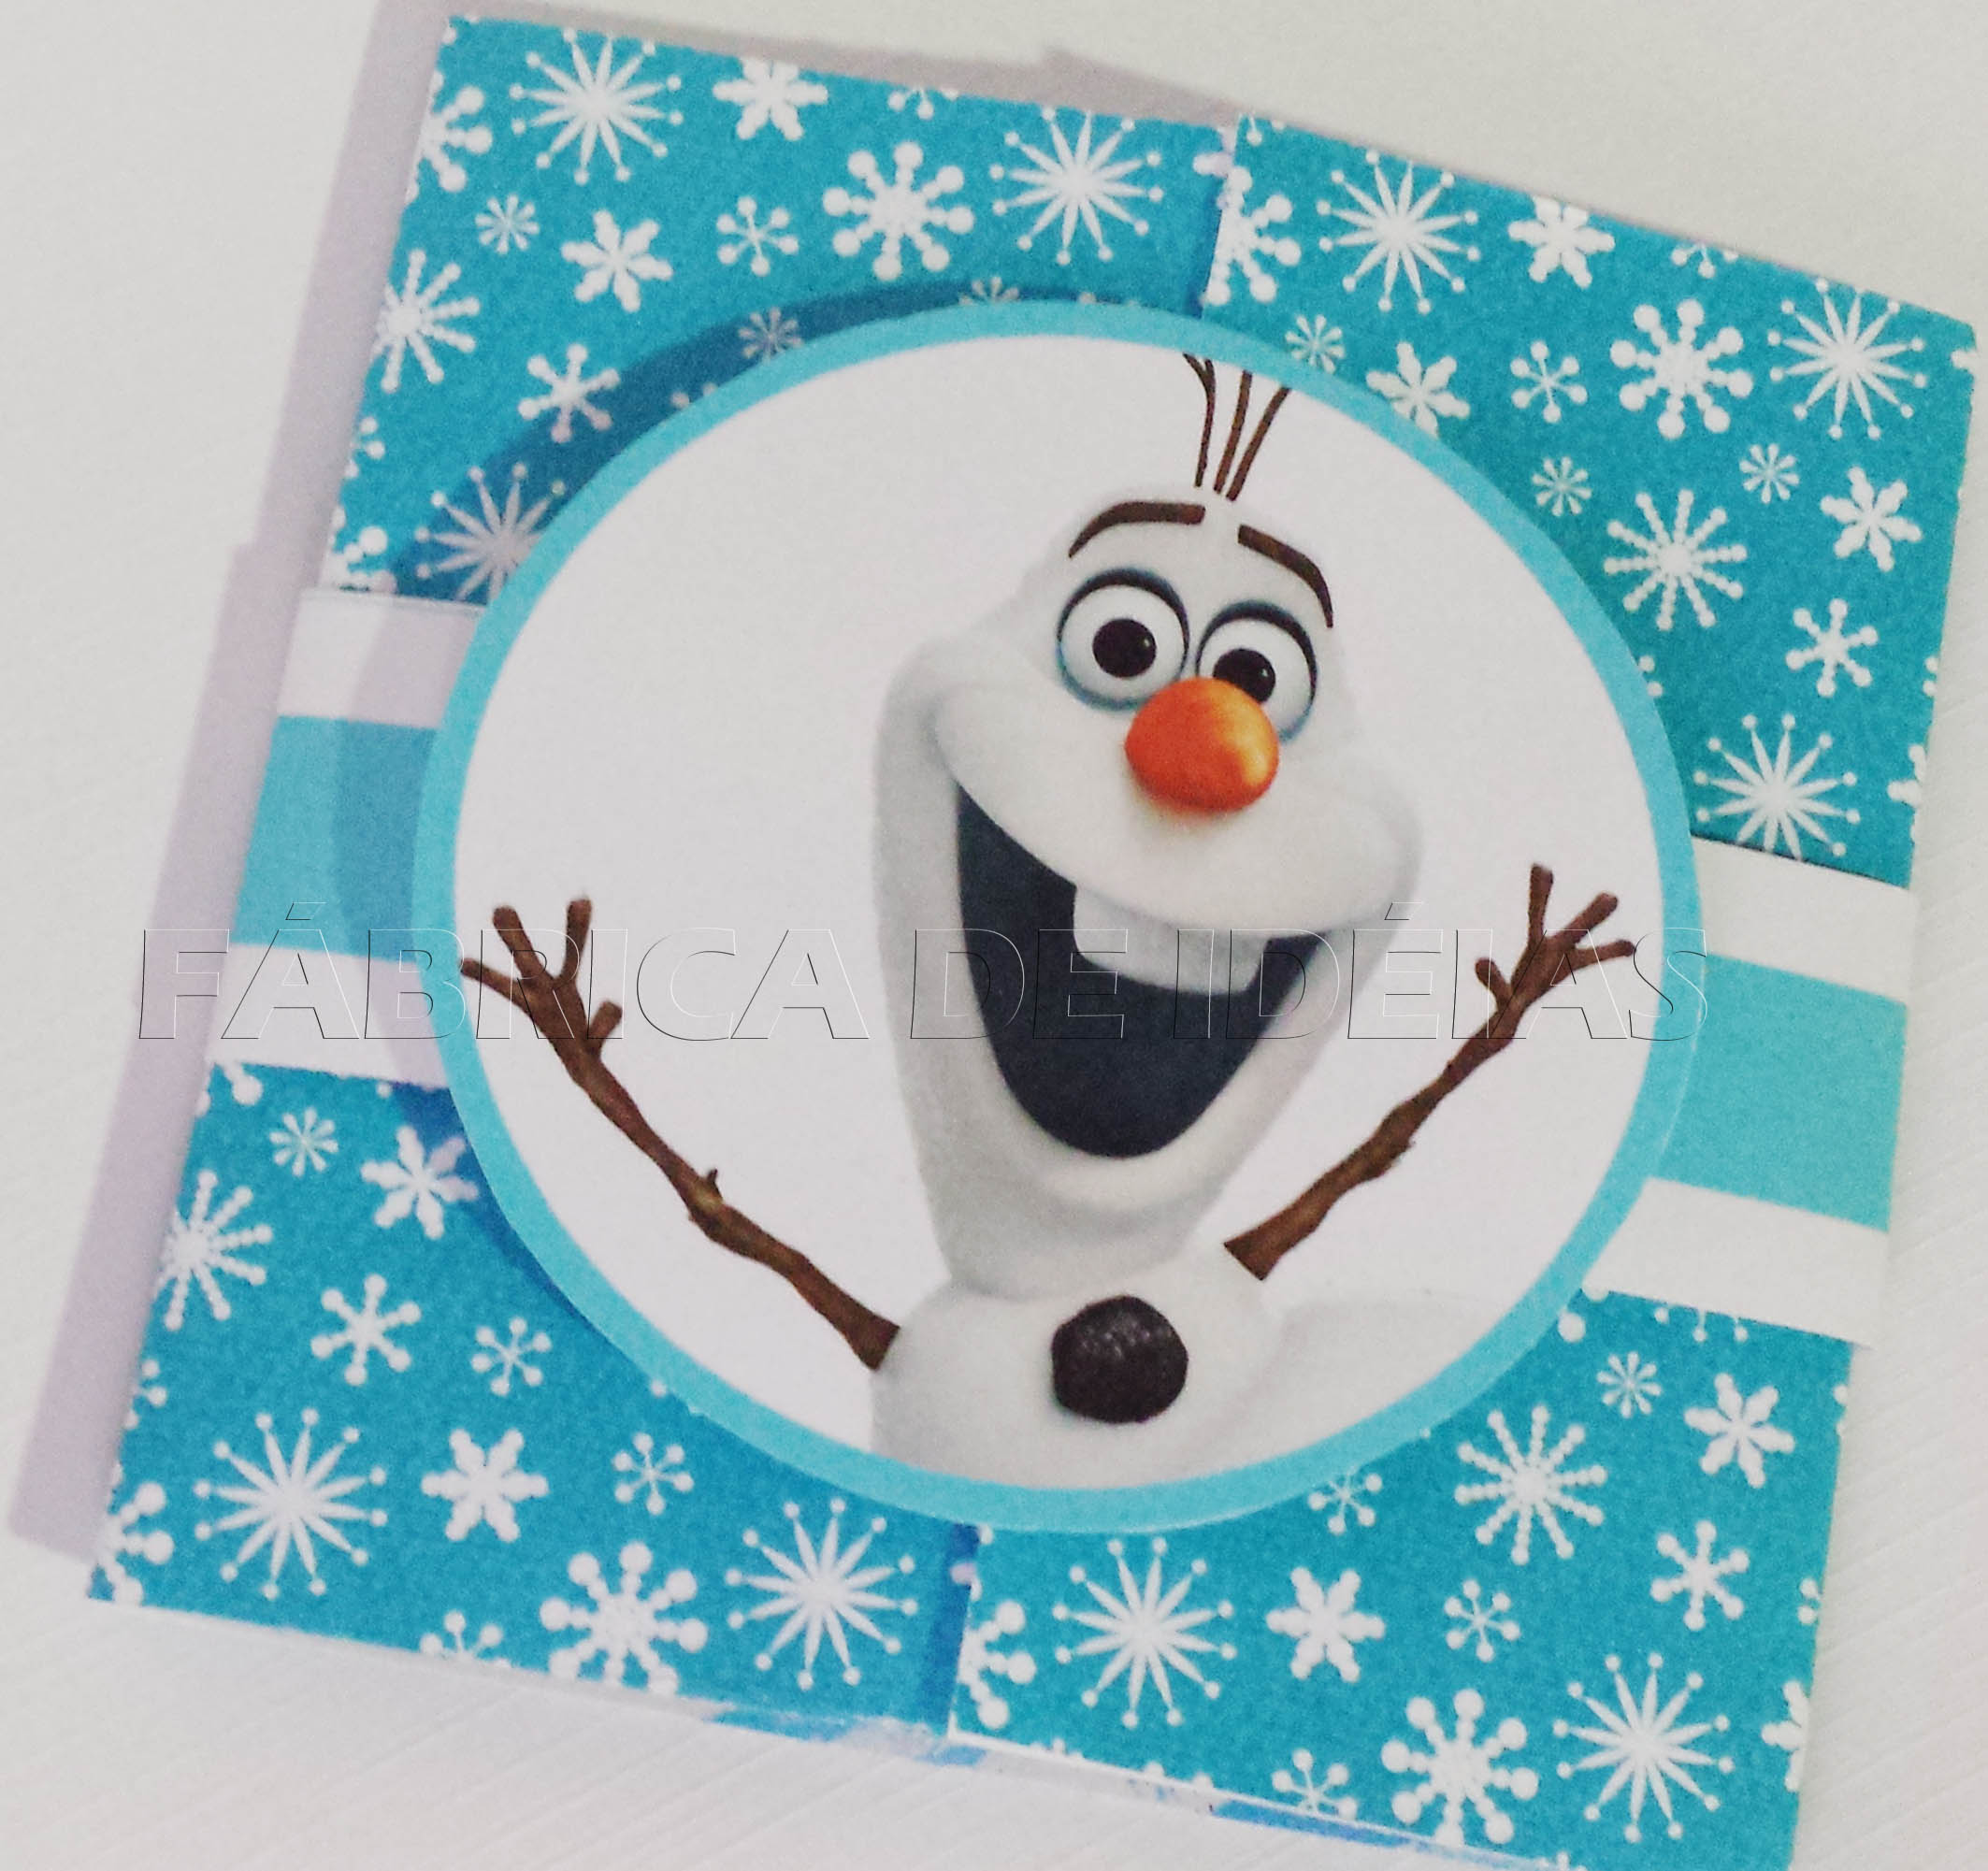 Scrap Convite Frozen em Scrap Convite Frozen em Scrap Convite Frozen